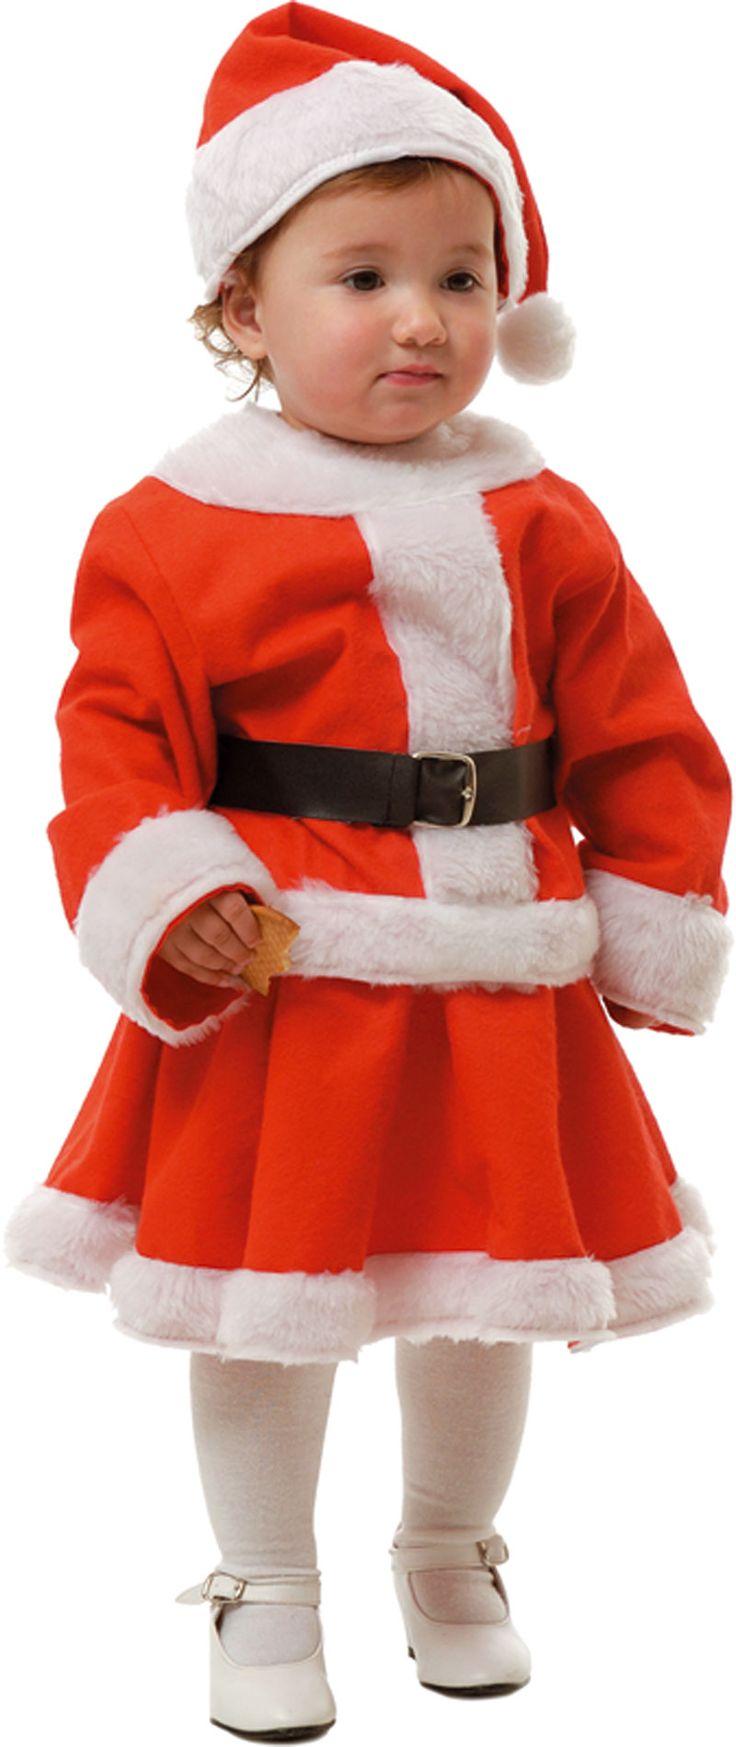 Disfraz mam noel infantil disfraces navidad christmas - Disfraz para bebes ...